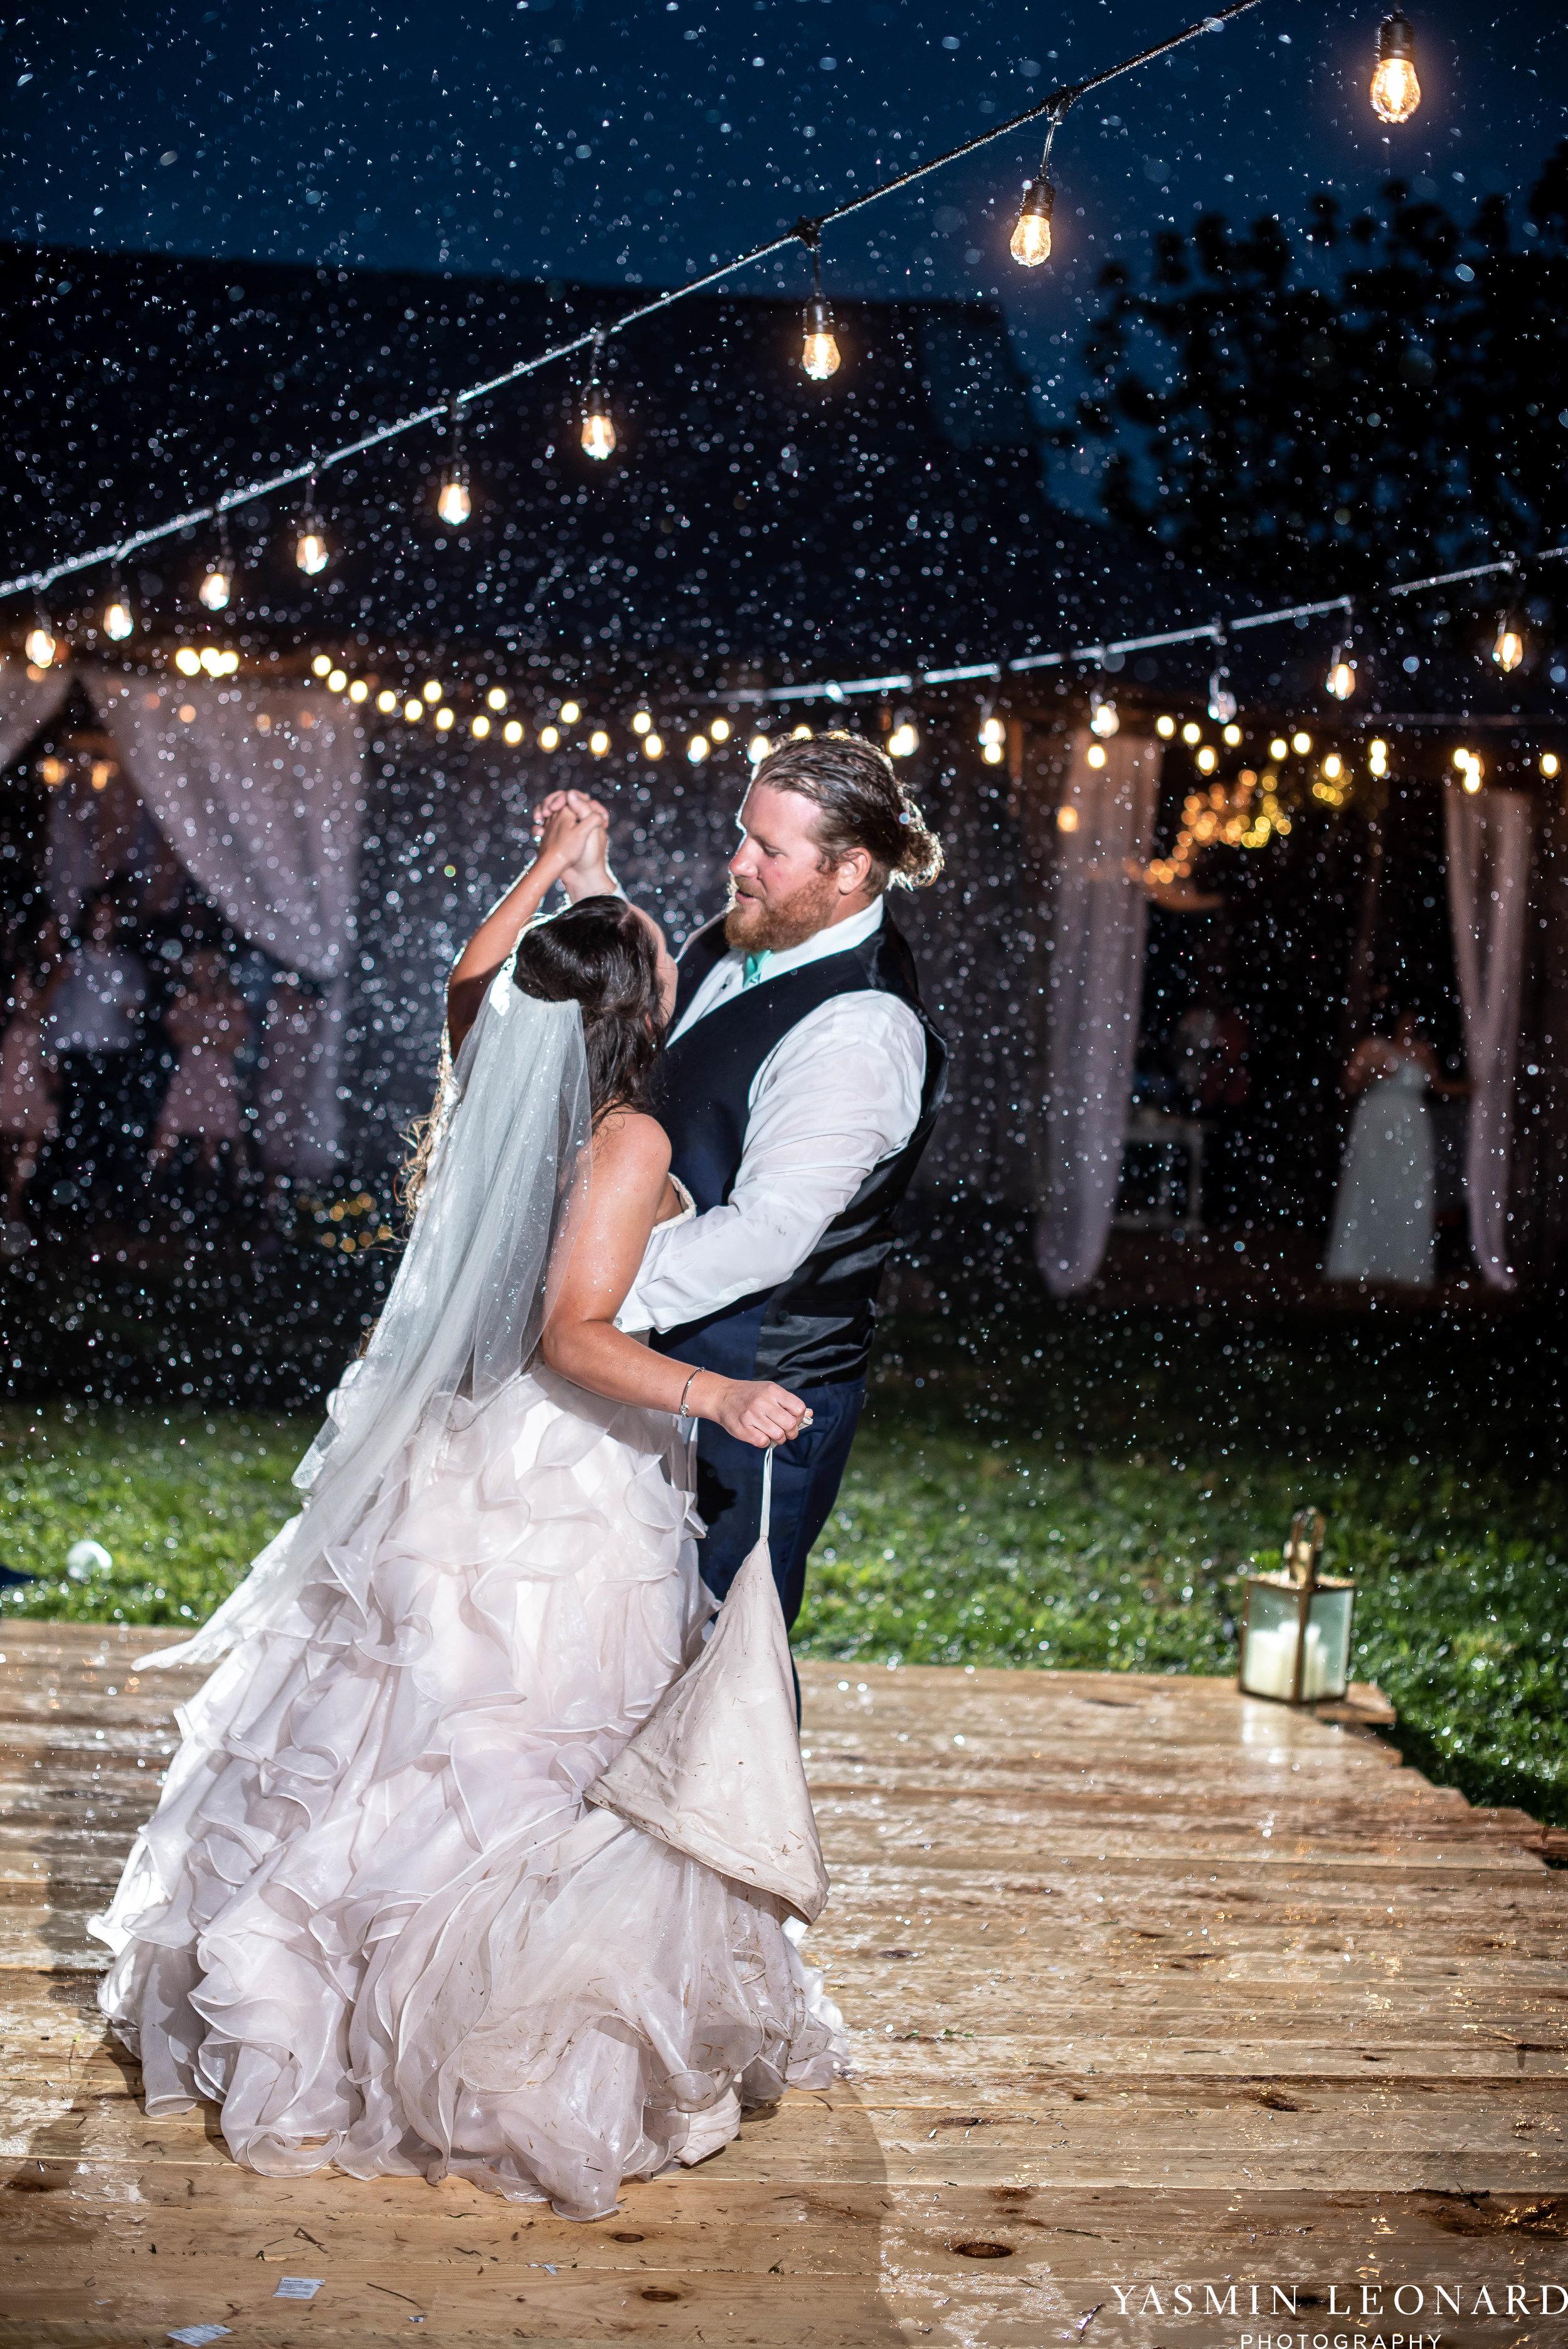 Rain on your wedding day - Rainy Wedding - Plan B for Rain - What to do if it rains on your wedding day - Wedding Inspiration - Outdoor wedding ideas - Rainy Wedding Pictures - Yasmin Leonard Photography-81.jpg